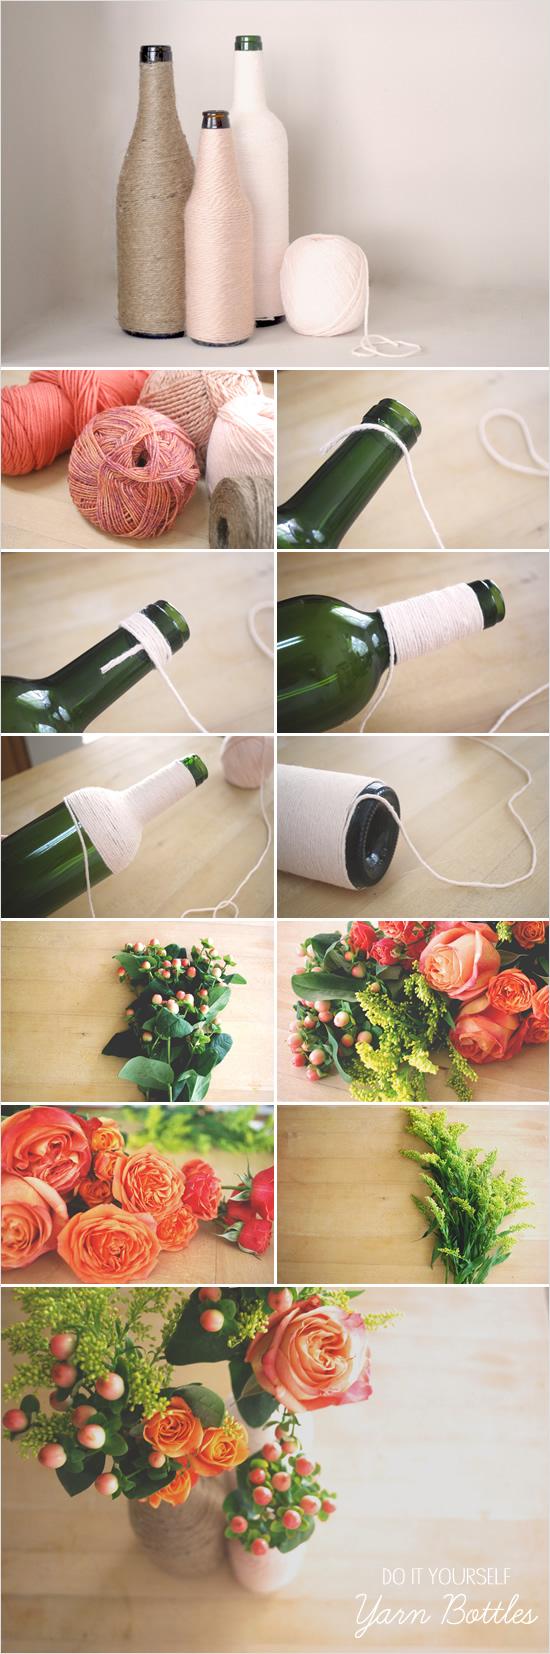 diy-centro-de-mesa-garrafas-personalizadas 6